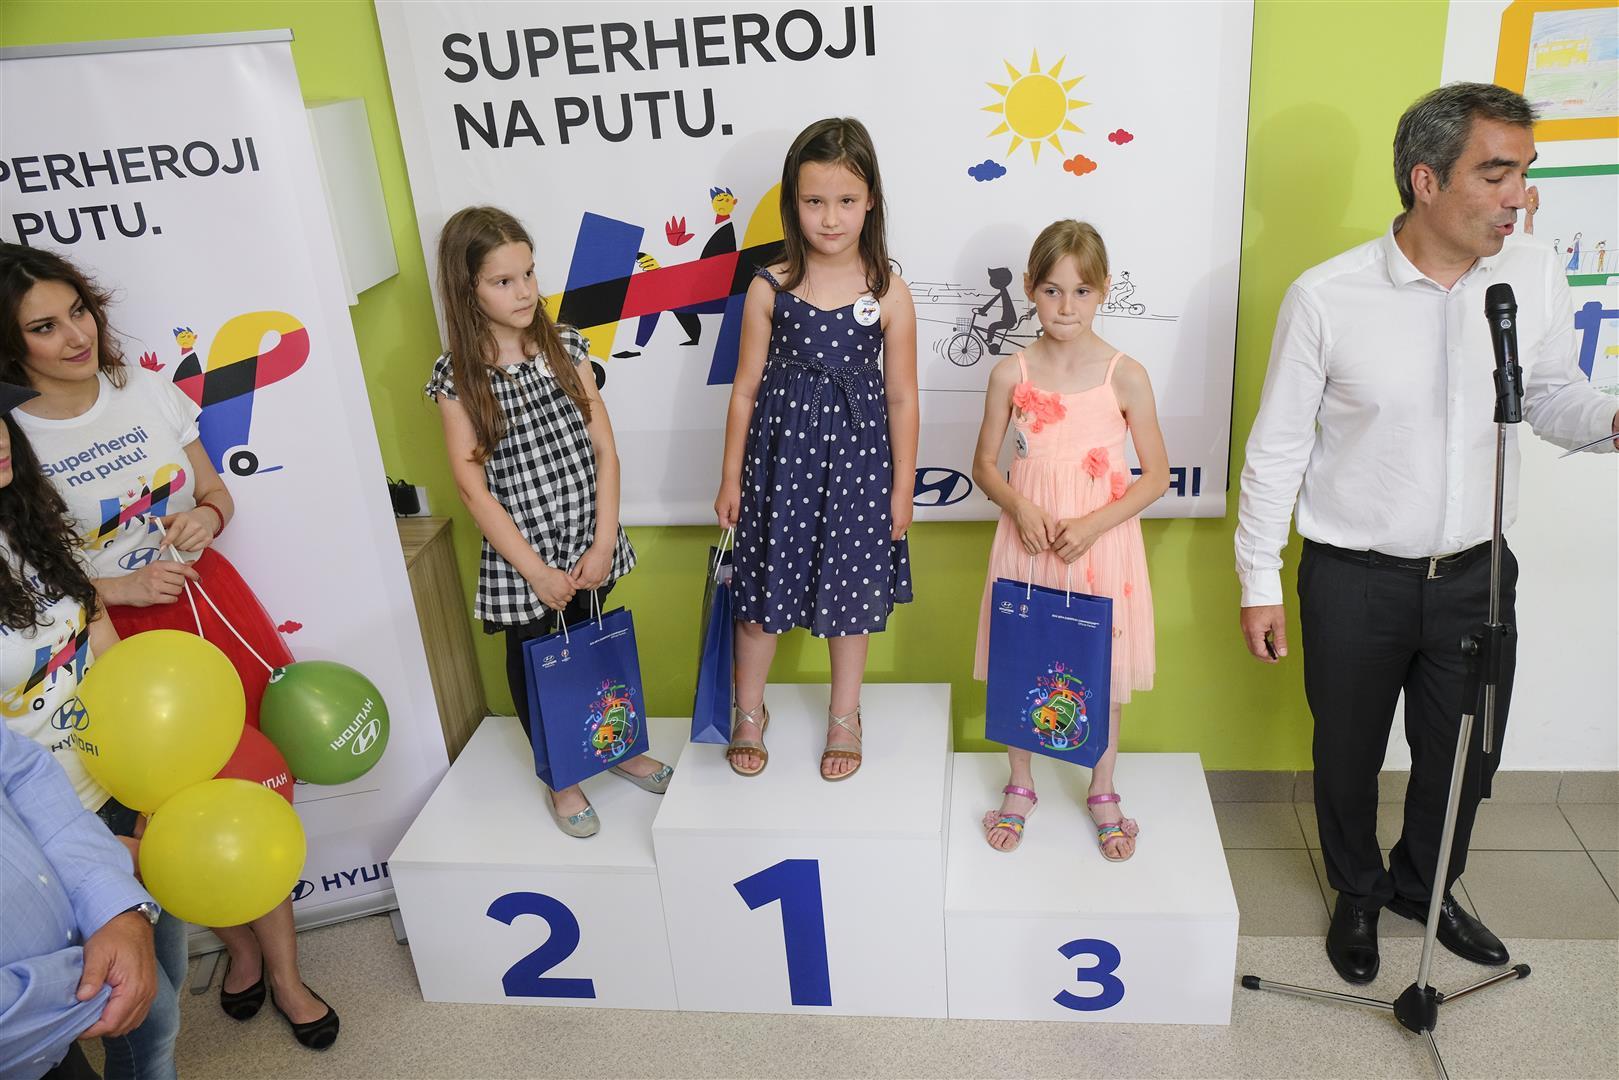 Hyundai Srbija dodelila nagrade najuspešnijim autorima likovnih radova